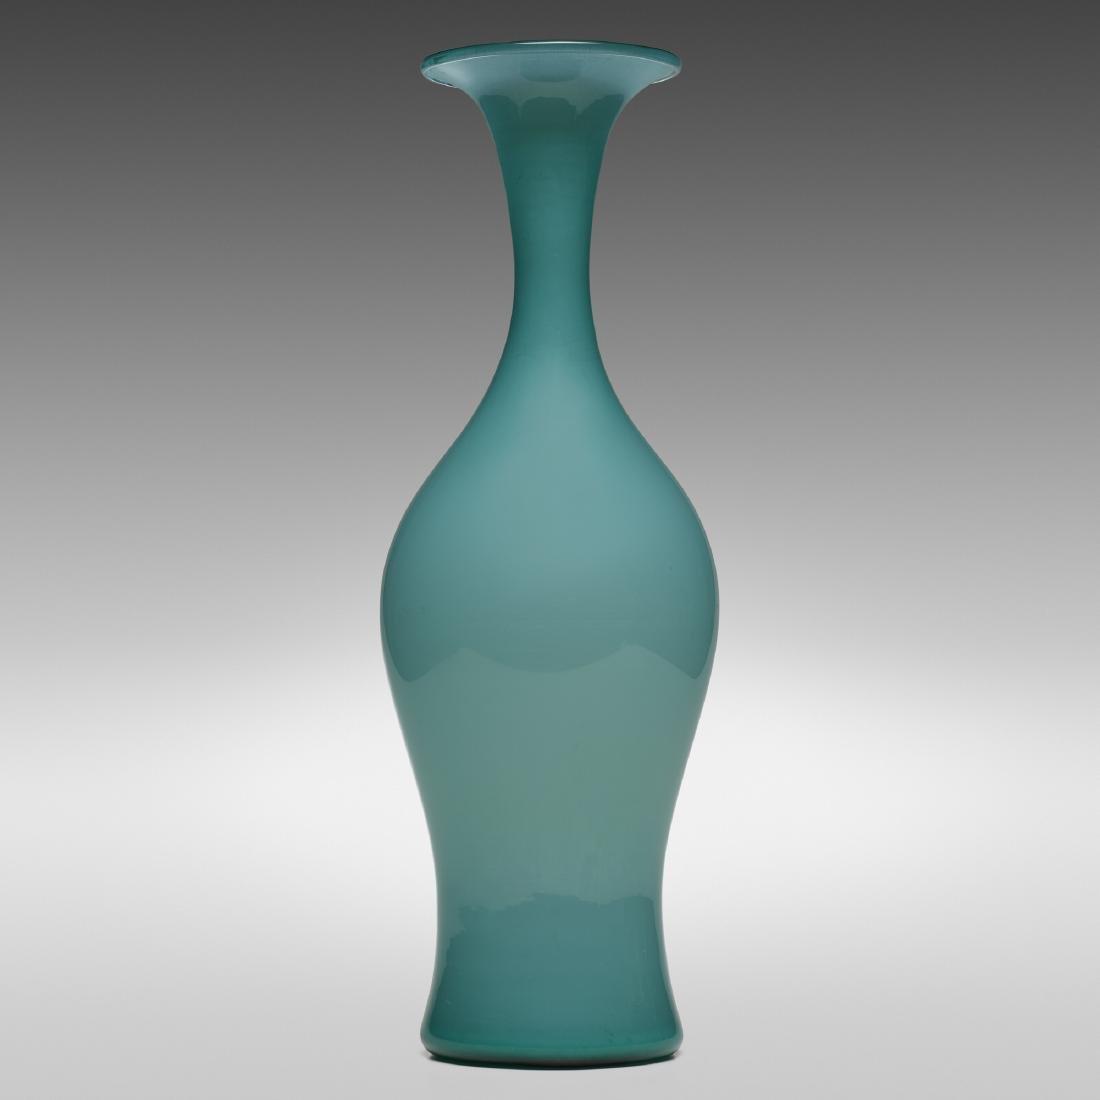 Paolo Venini, Monumental Opalino vase, model 3556